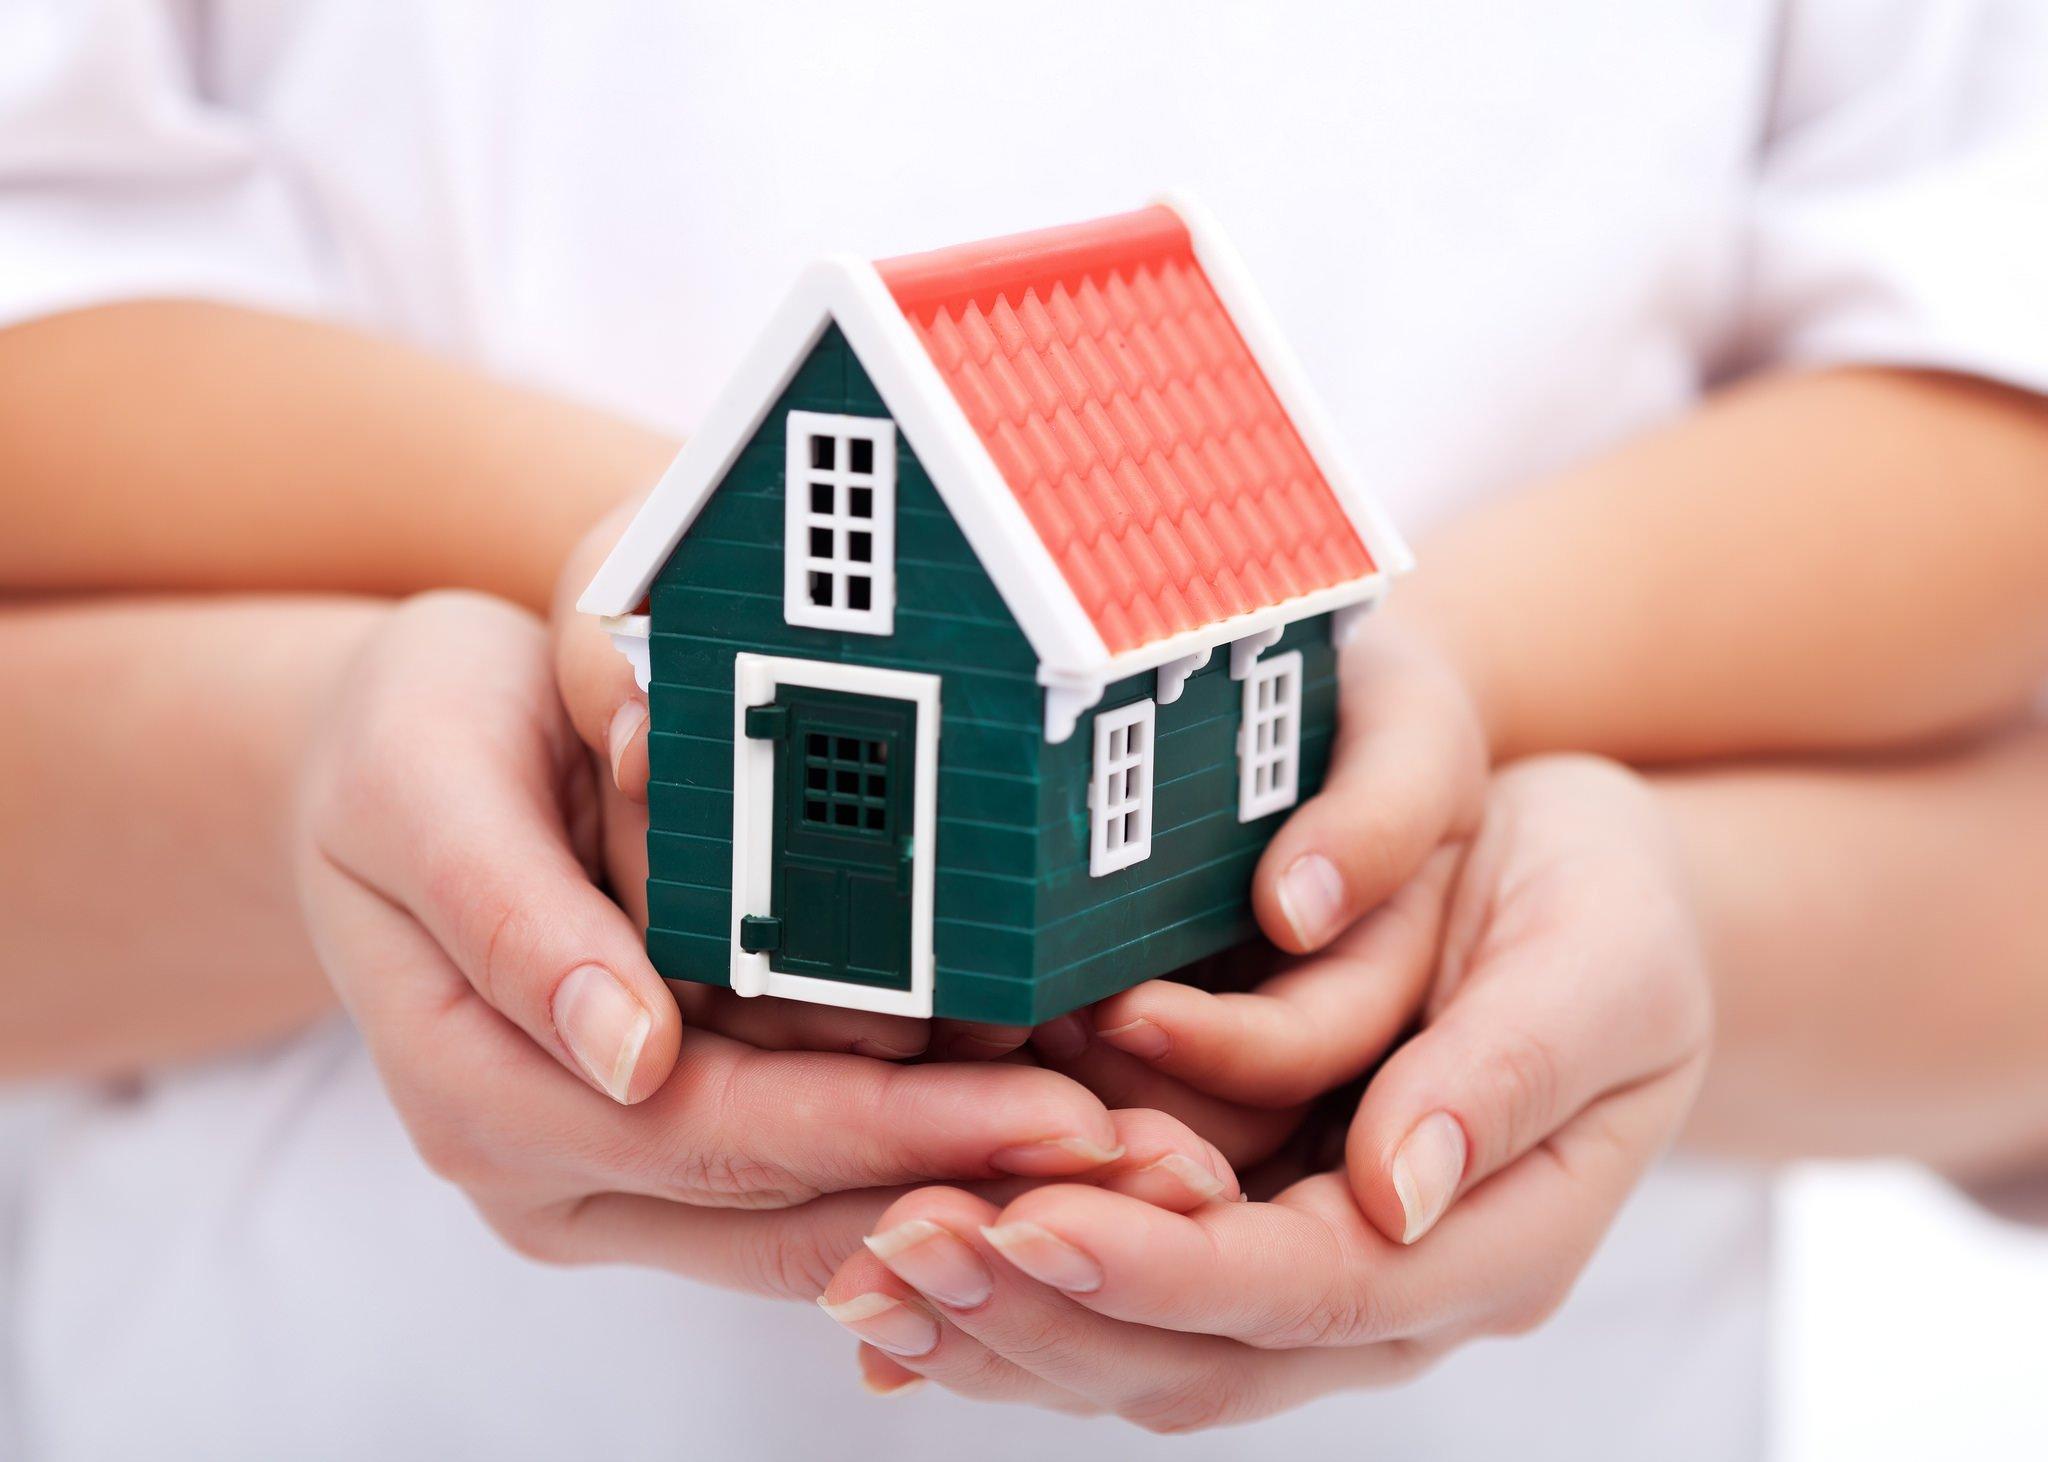 Antifurto e videosorveglianza per la tua casa elettron - Antifurto casa 365 ...